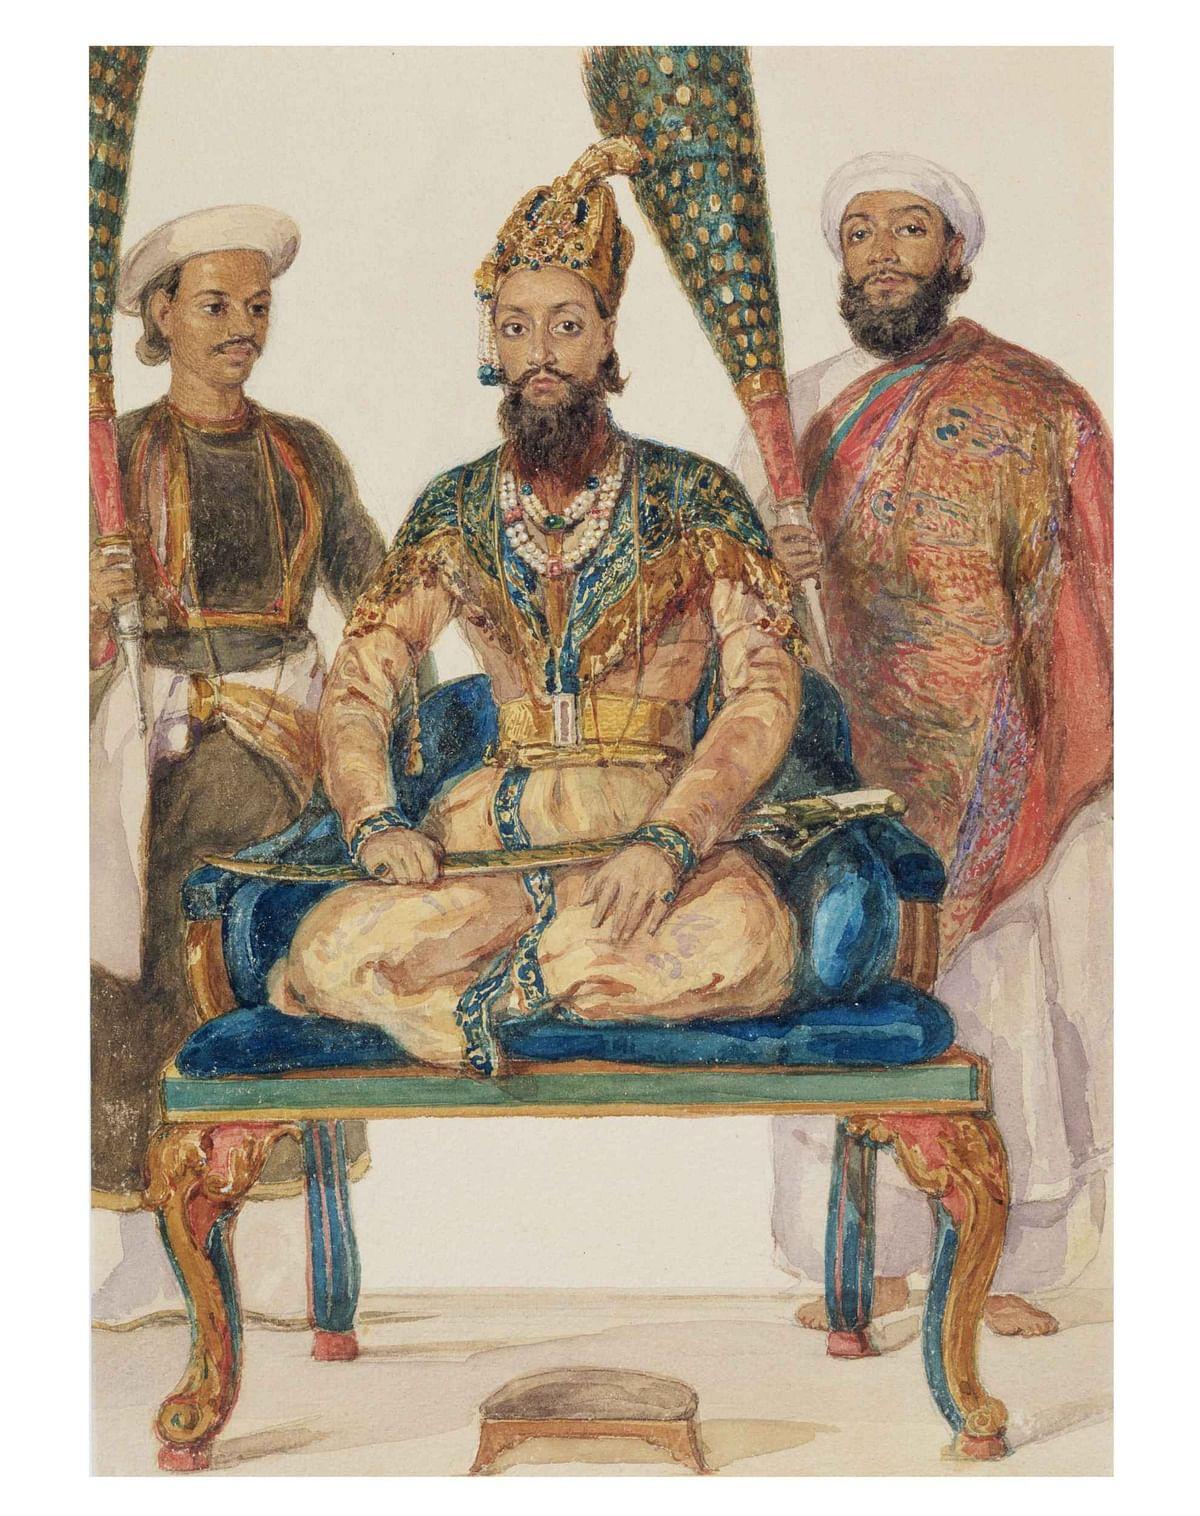 Alauddin Khilji, the second ruler of the Khilji Dynasty